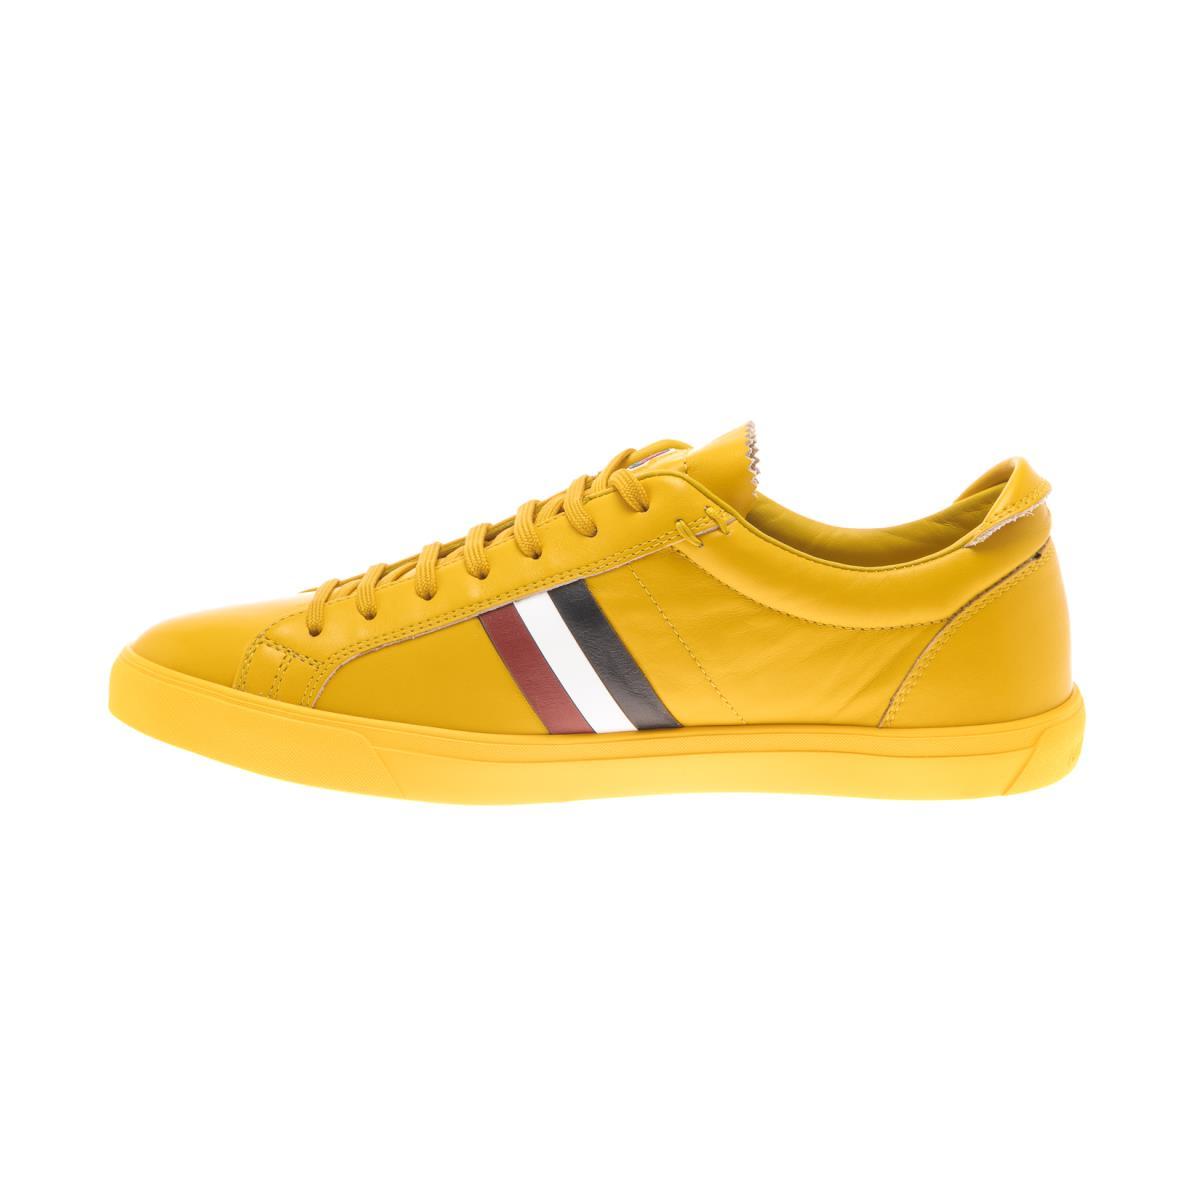 scarpa moncler